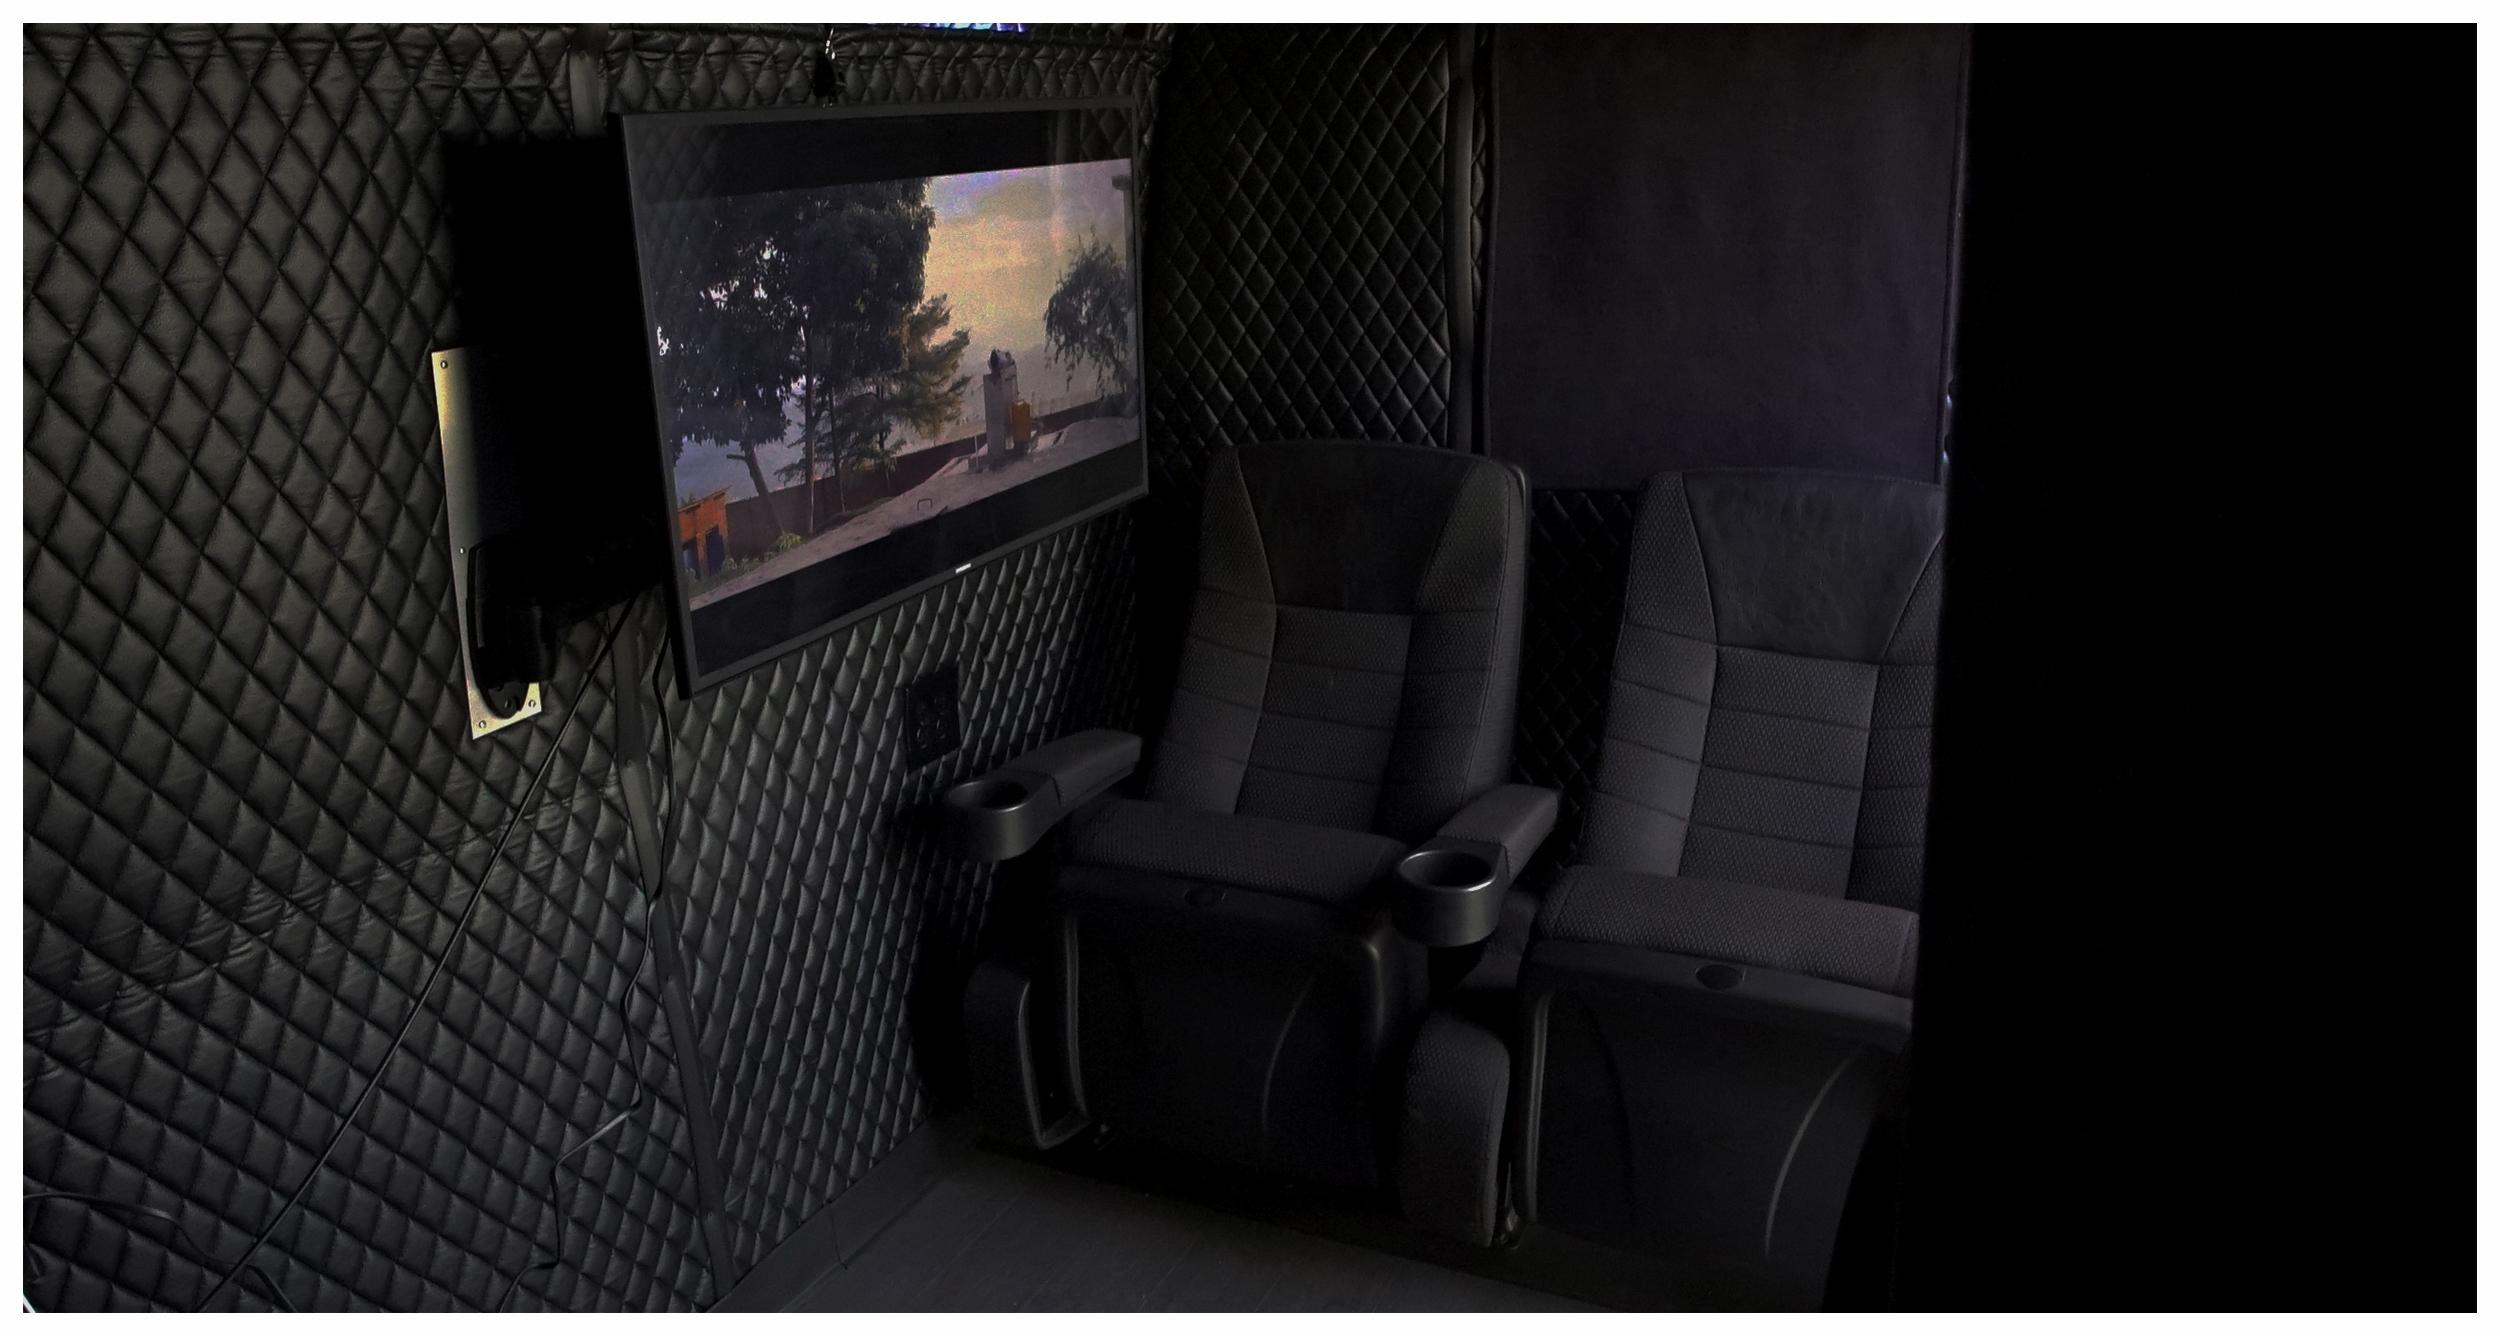 monitors_wide_seats1a1.jpg